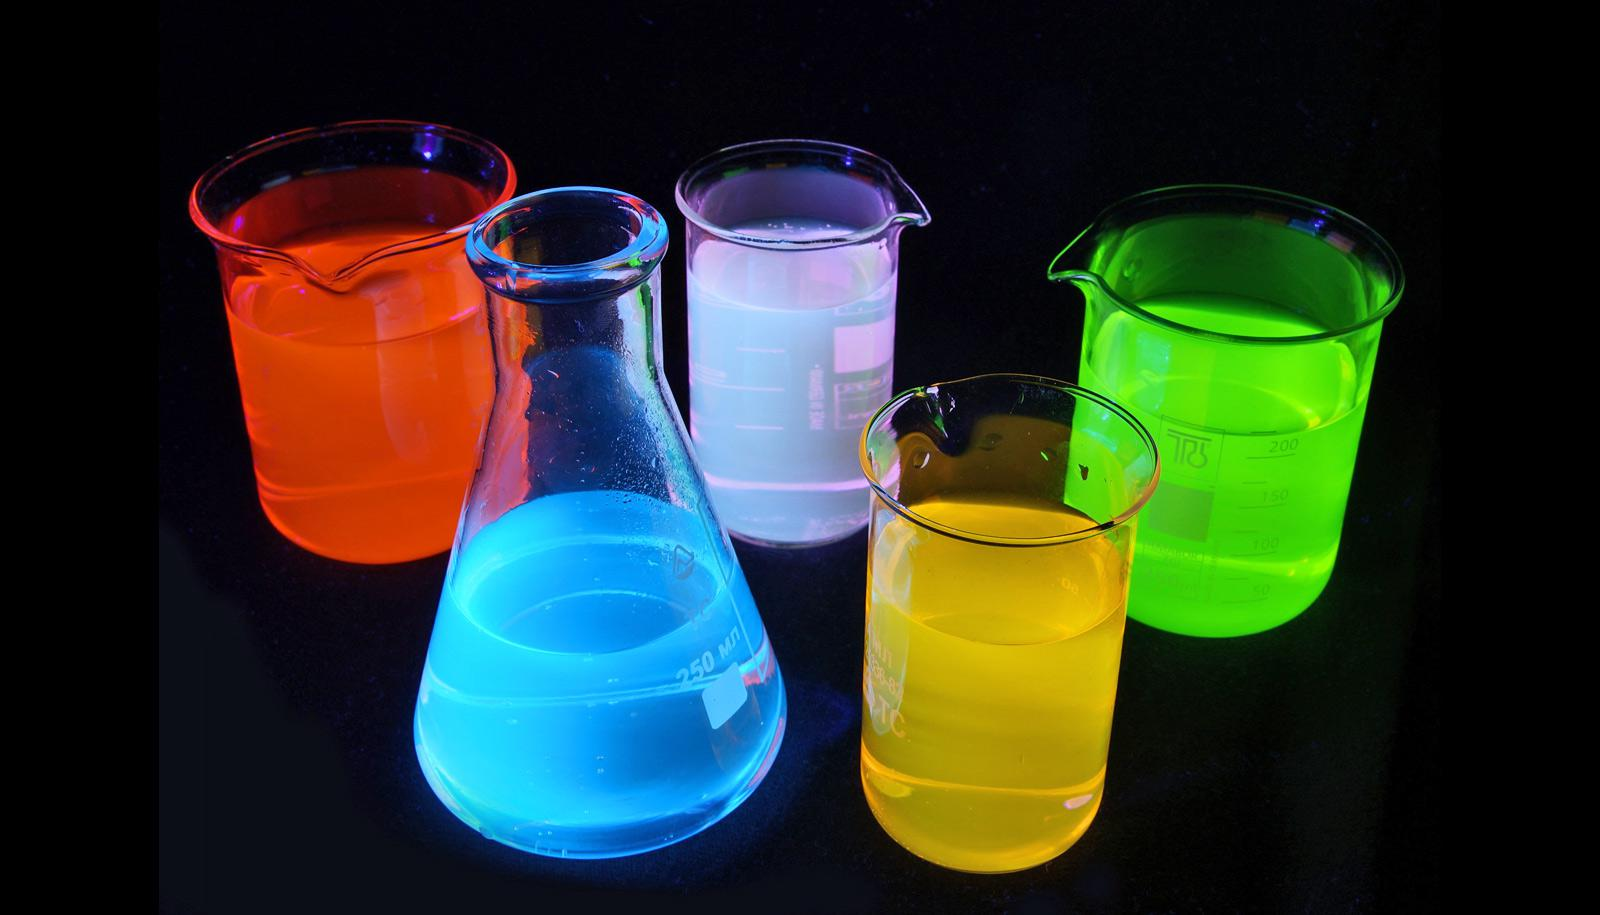 Fluorescent solutions in lab glass under UV-light.